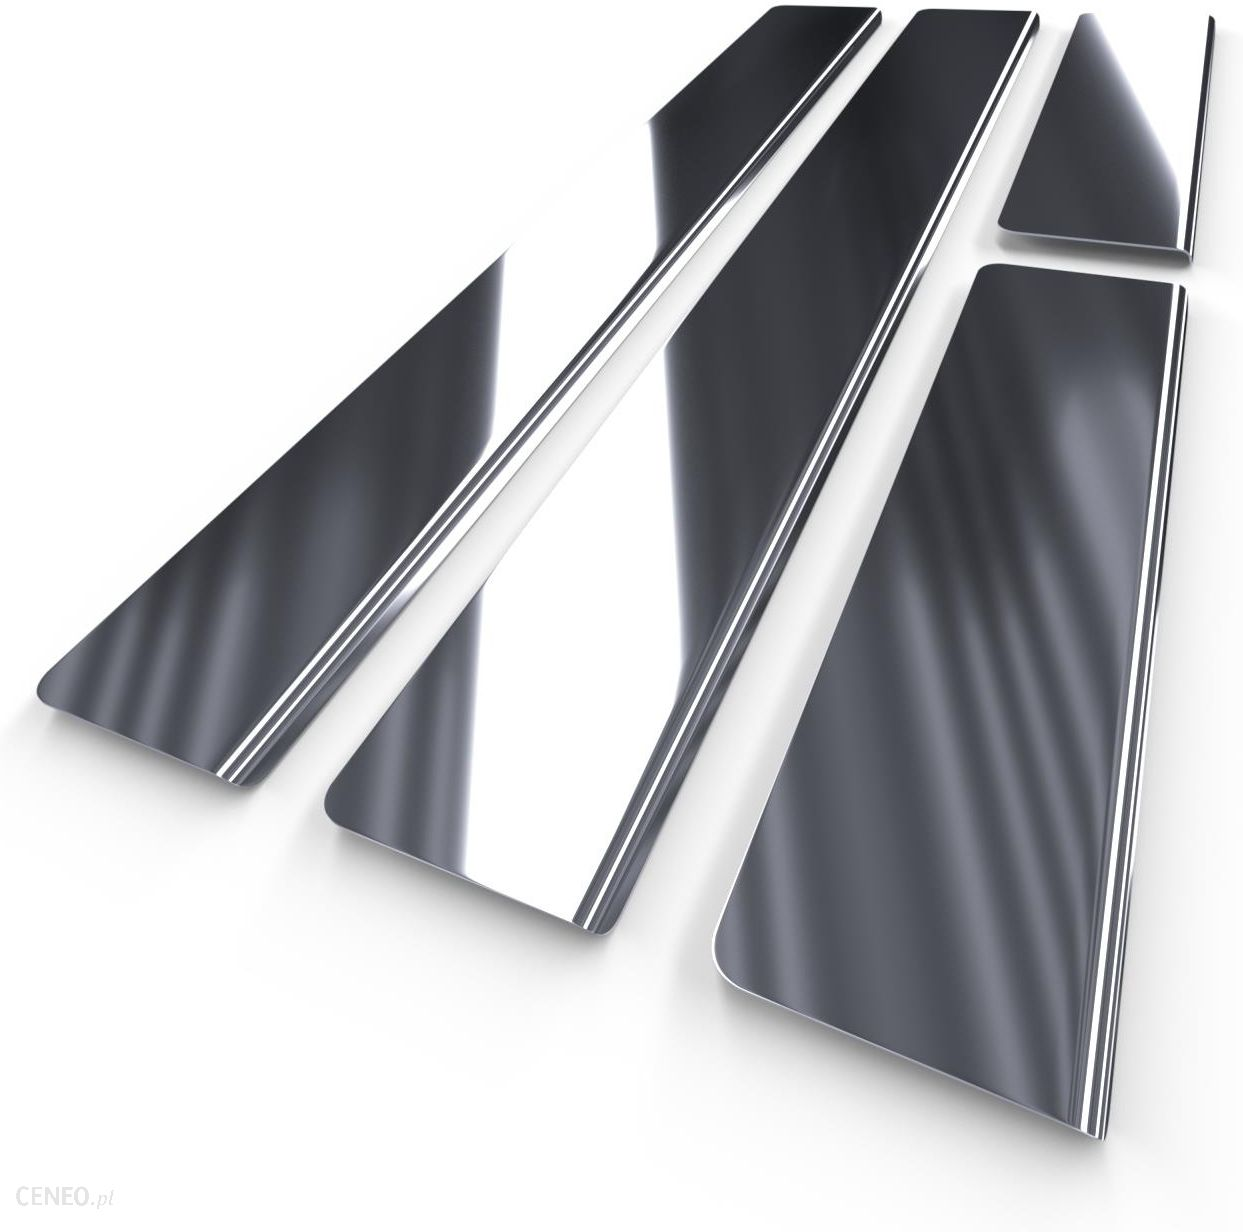 nak adki progowe do citroen c4 aircross 2012 opinie i ceny na. Black Bedroom Furniture Sets. Home Design Ideas